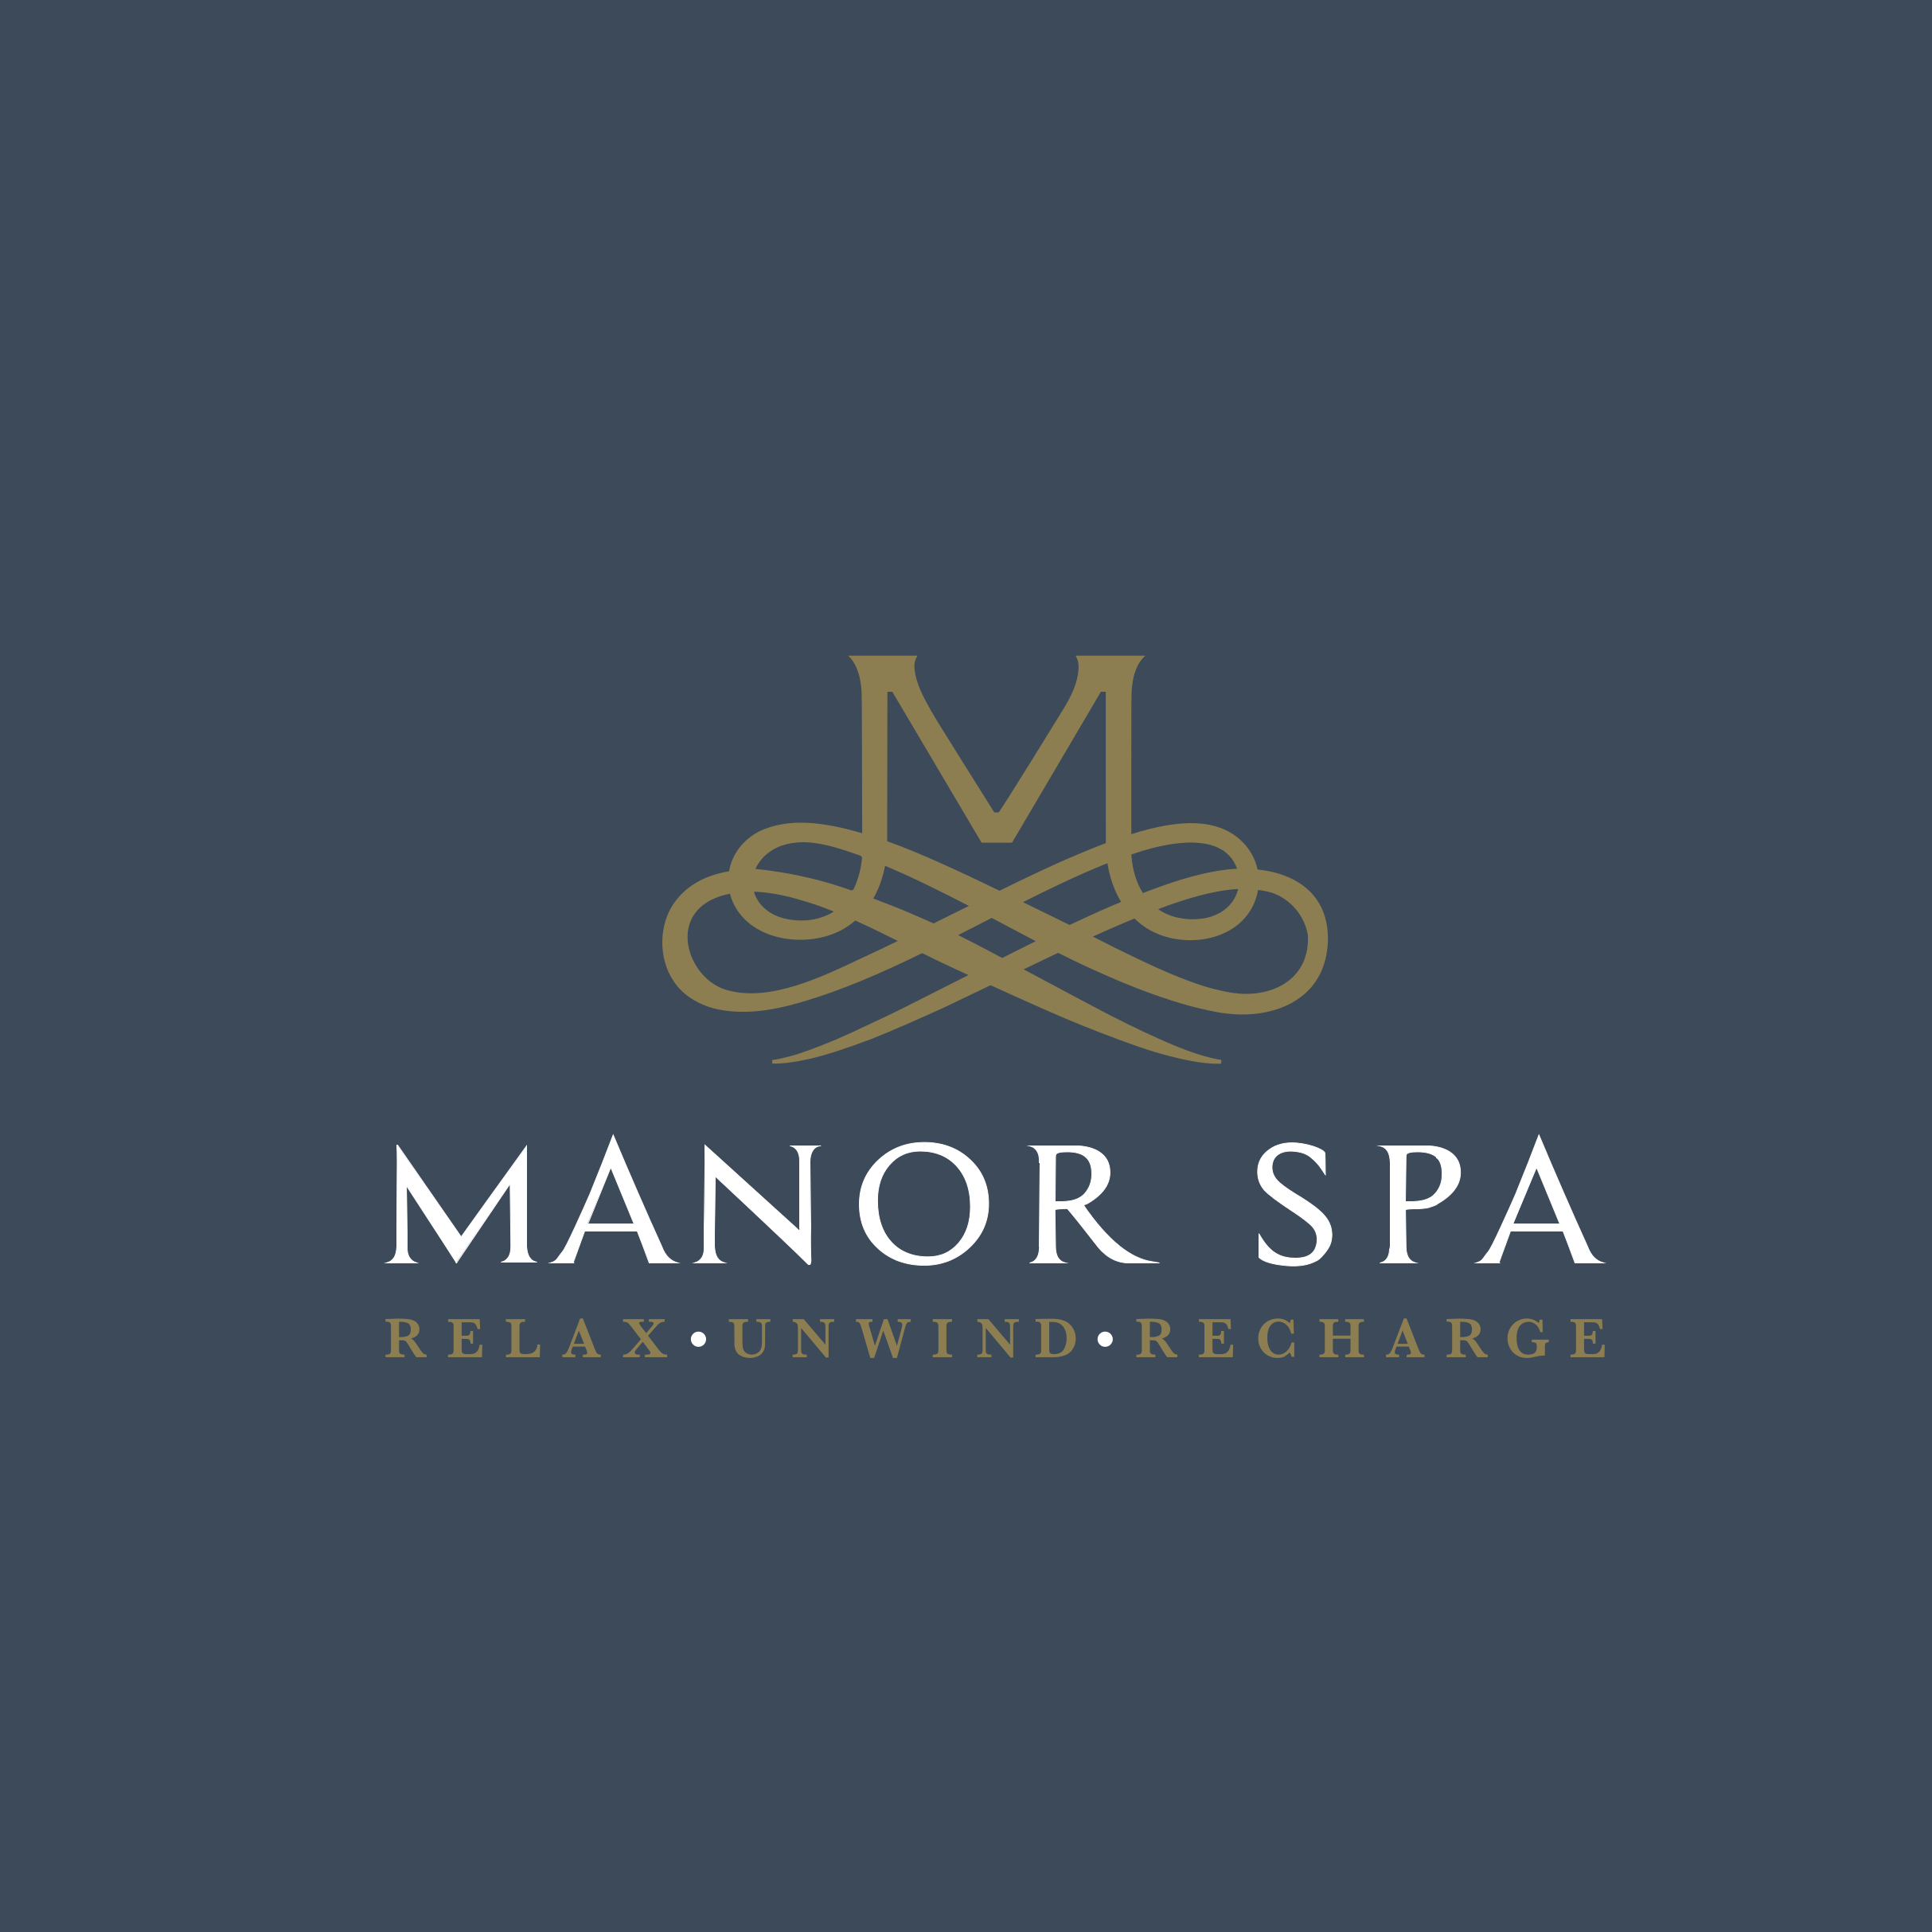 Manor House Hotel & Spa logo